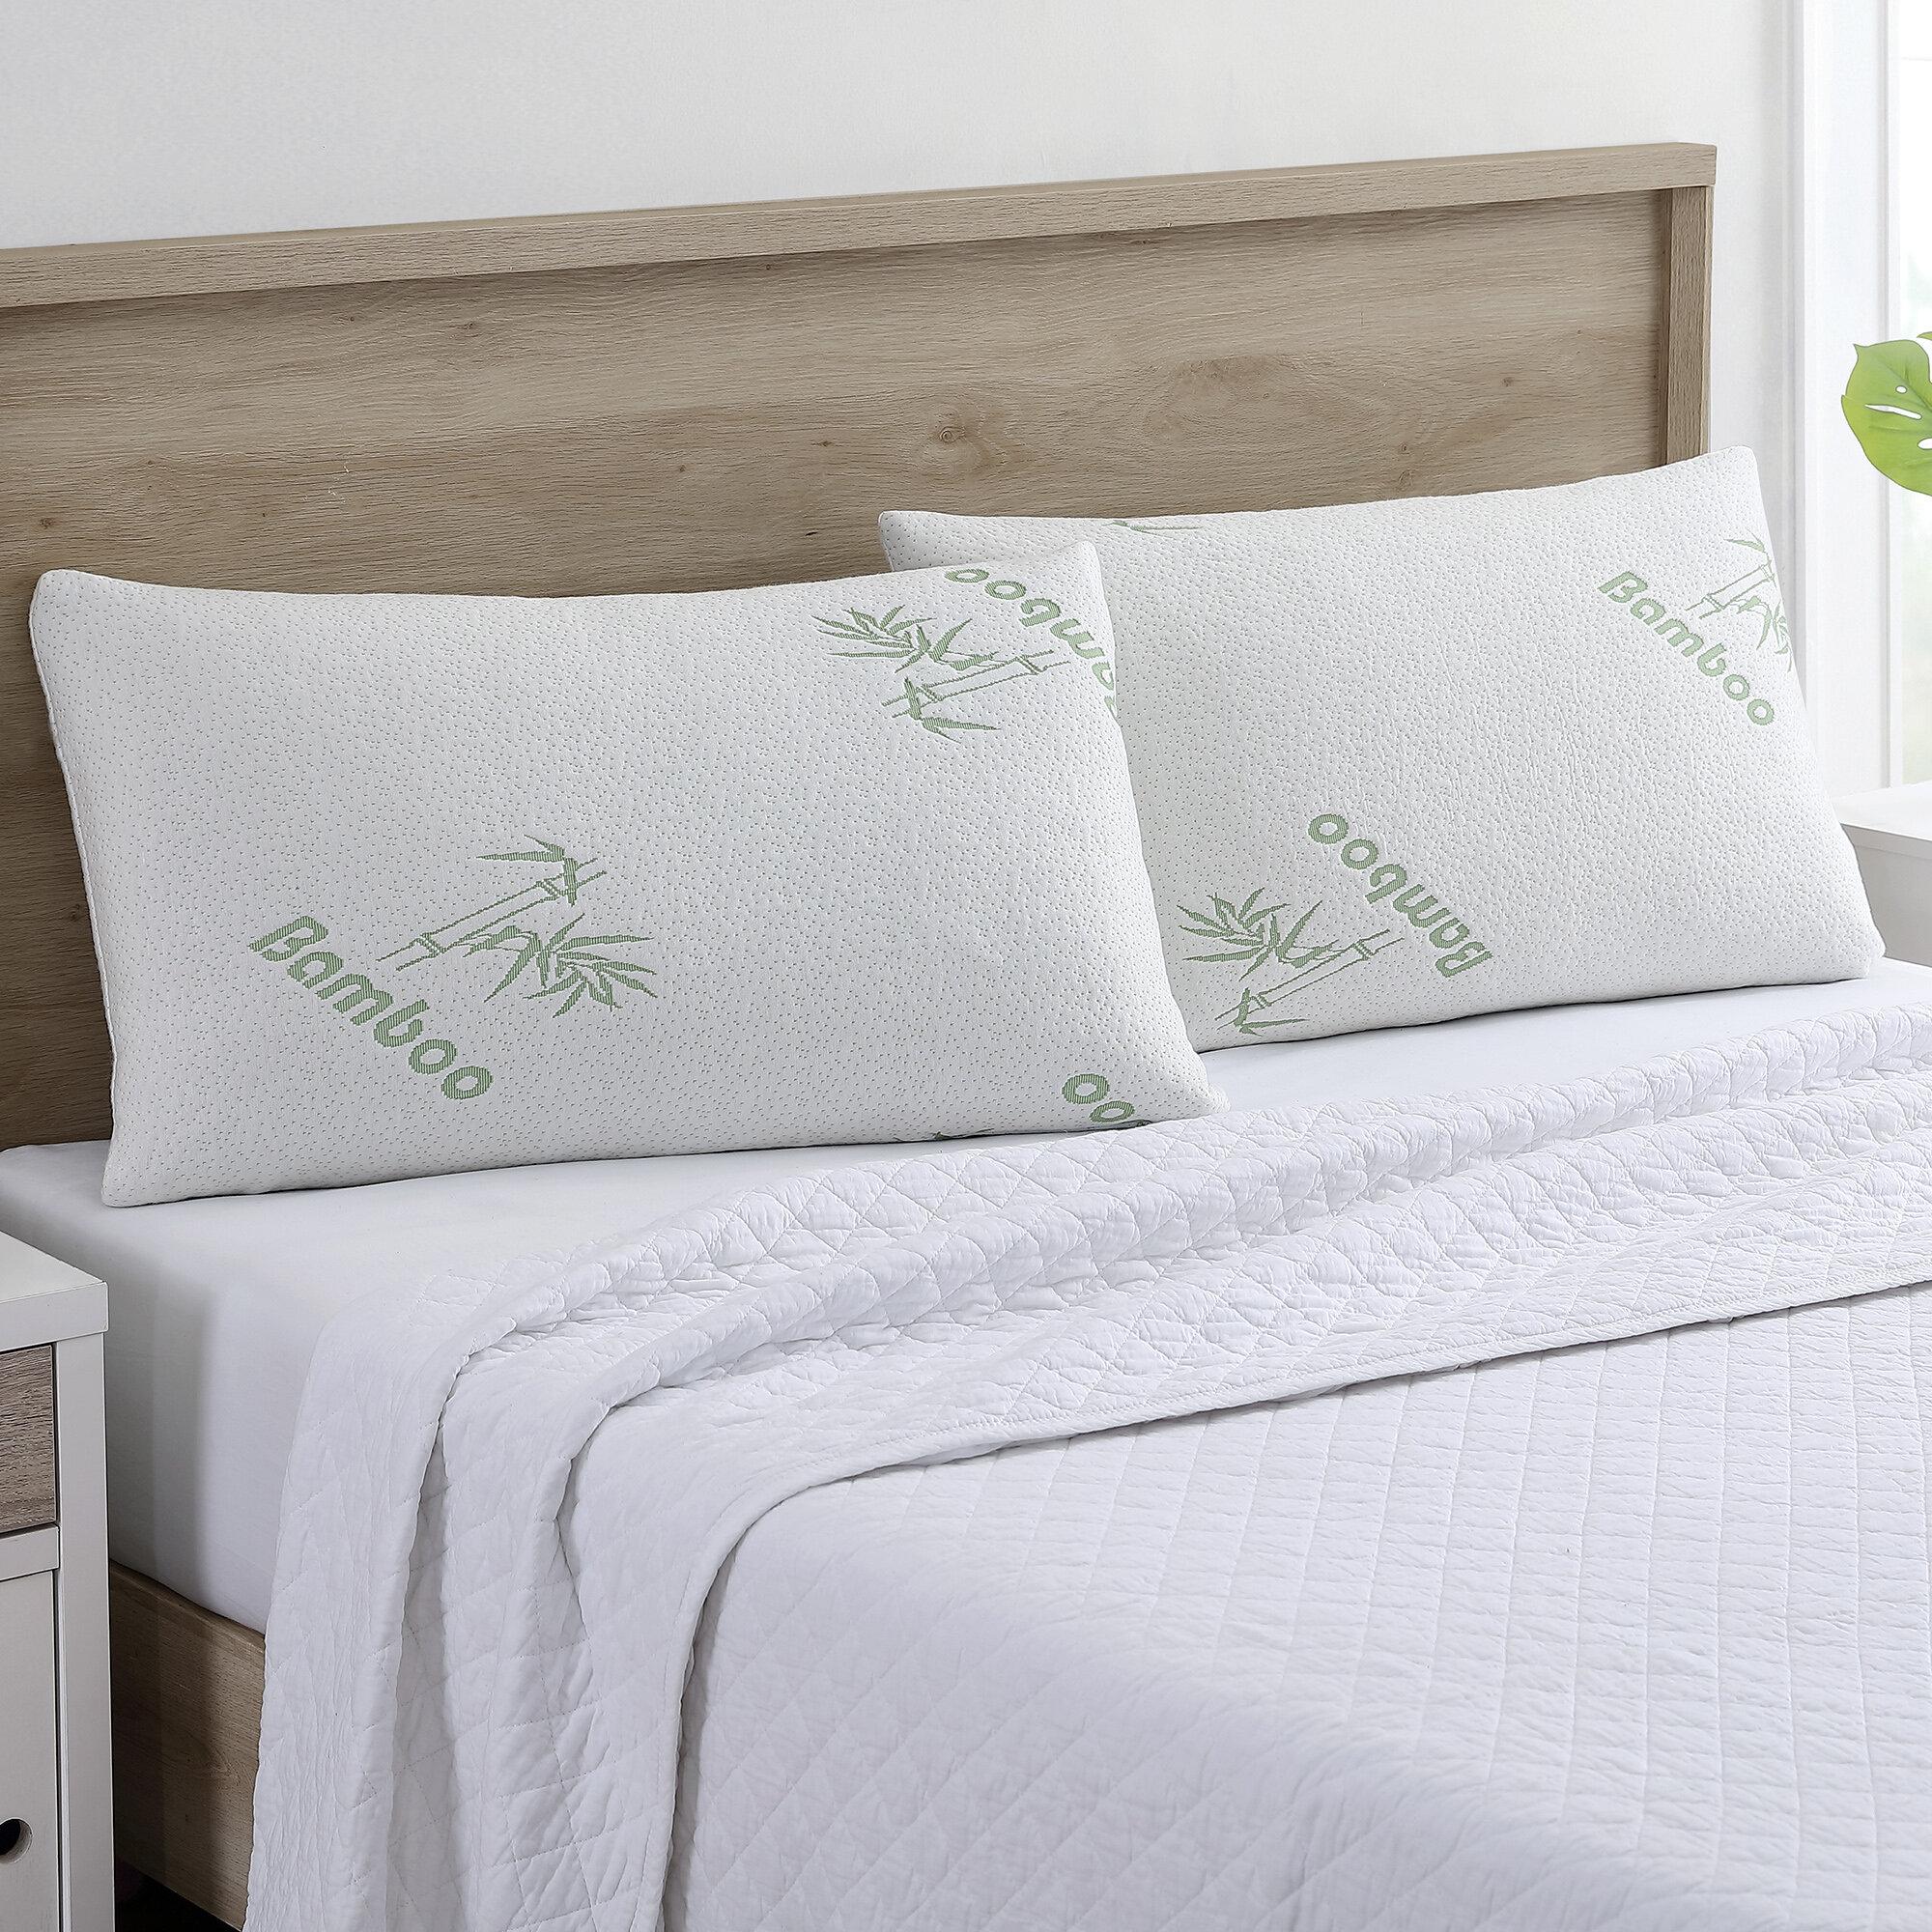 Alwyn Home Bonifacio Rayon From Bamboo Firm Memory Foam Bed Pillow